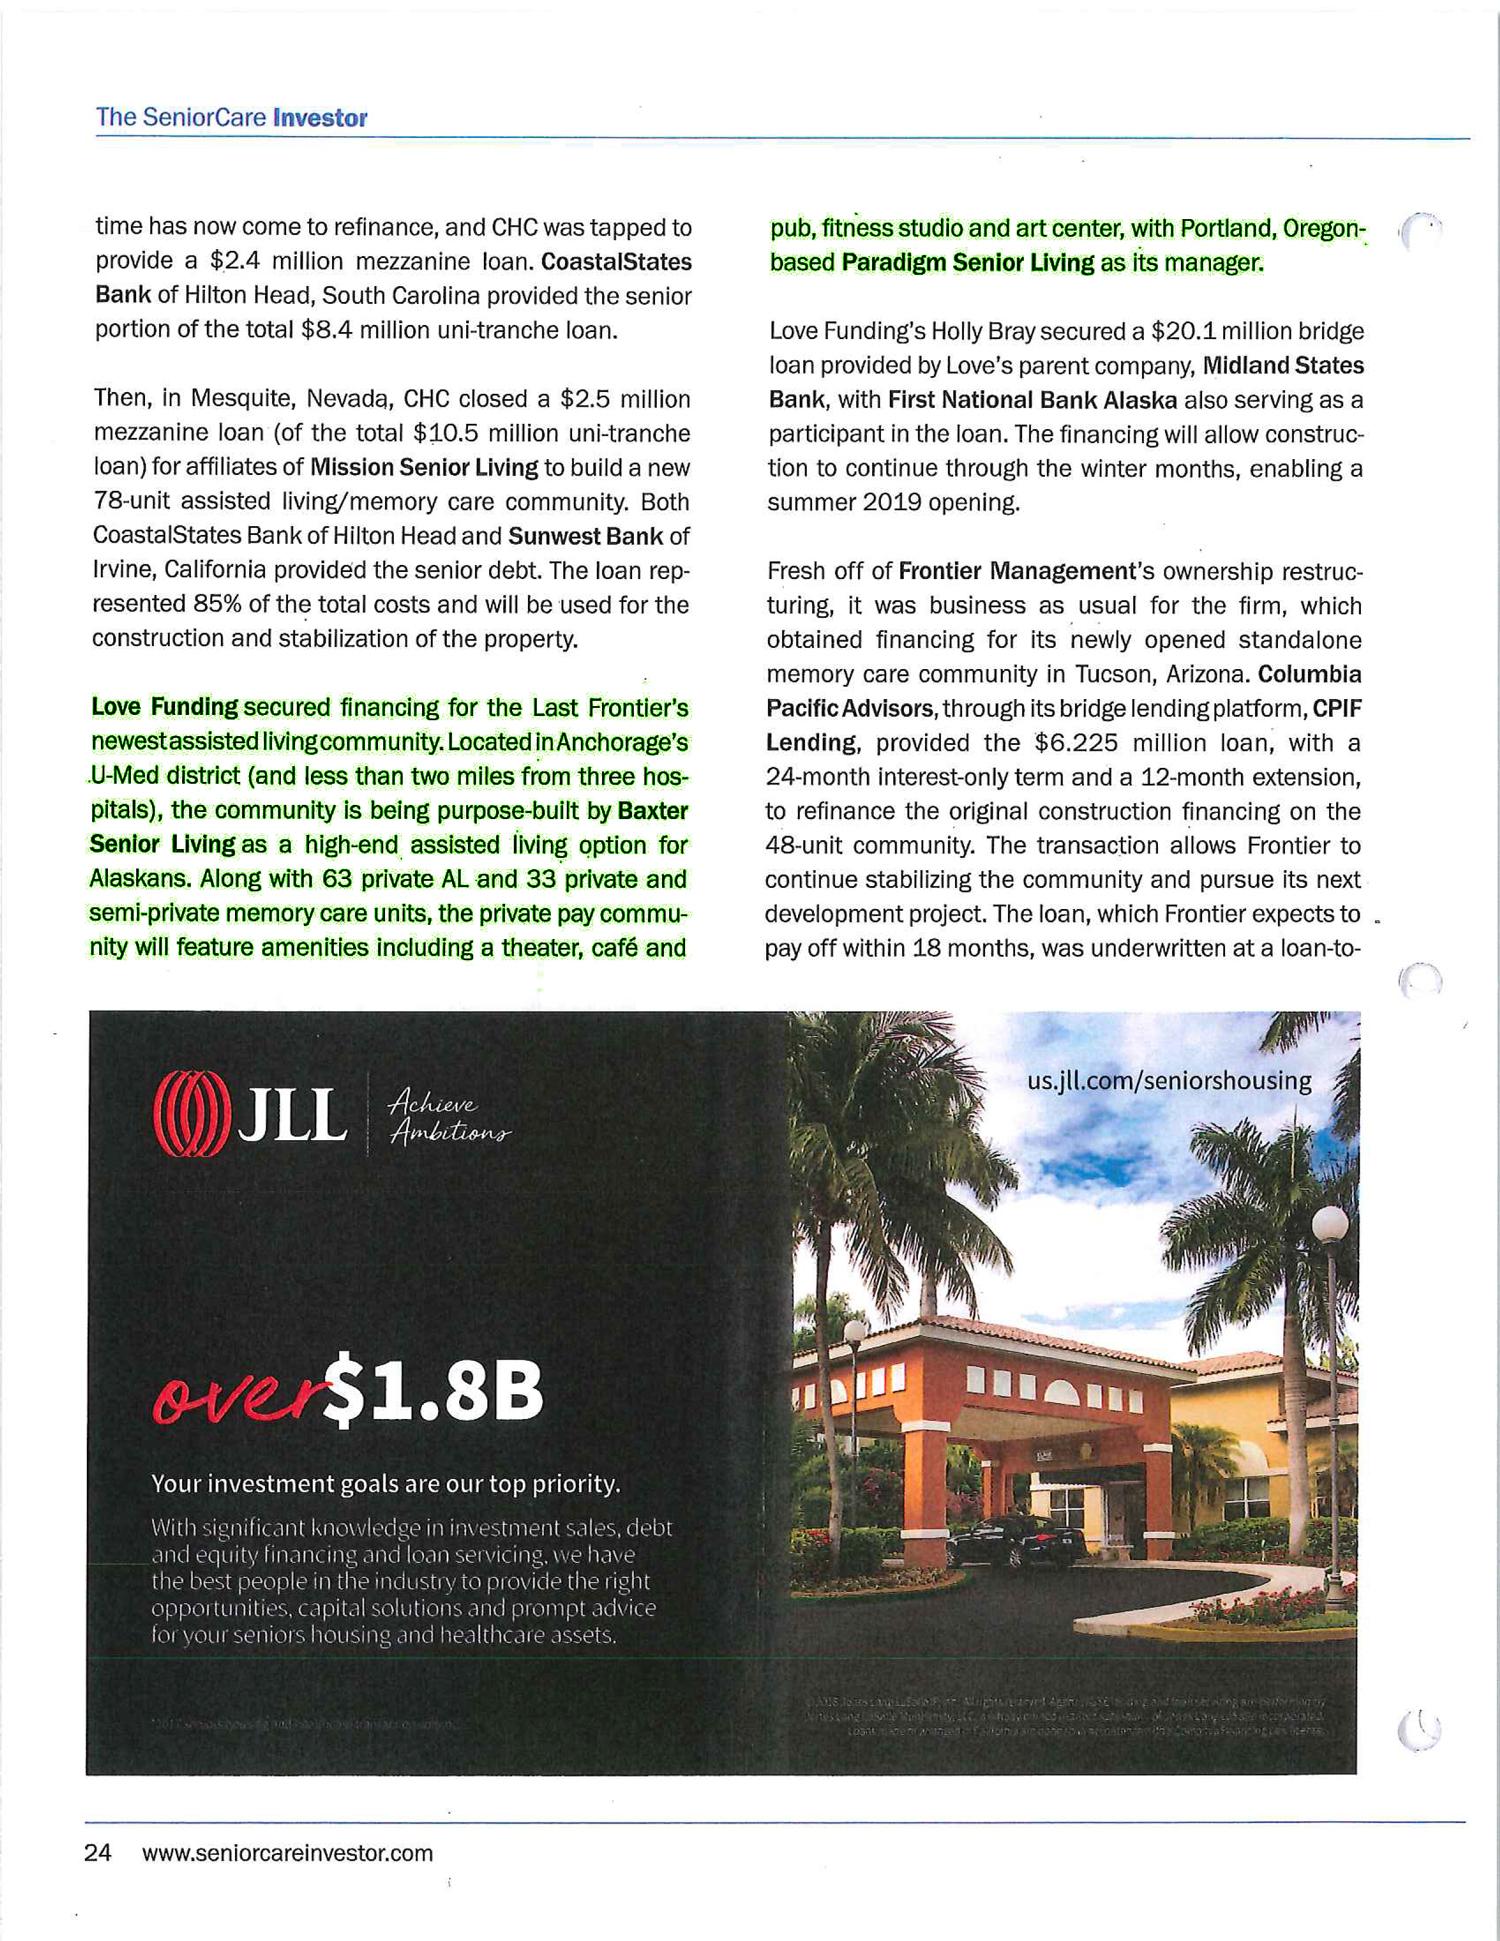 The Senior Care Investor Publication Featuring Baxter Senior Living and Paradigm Senior Living